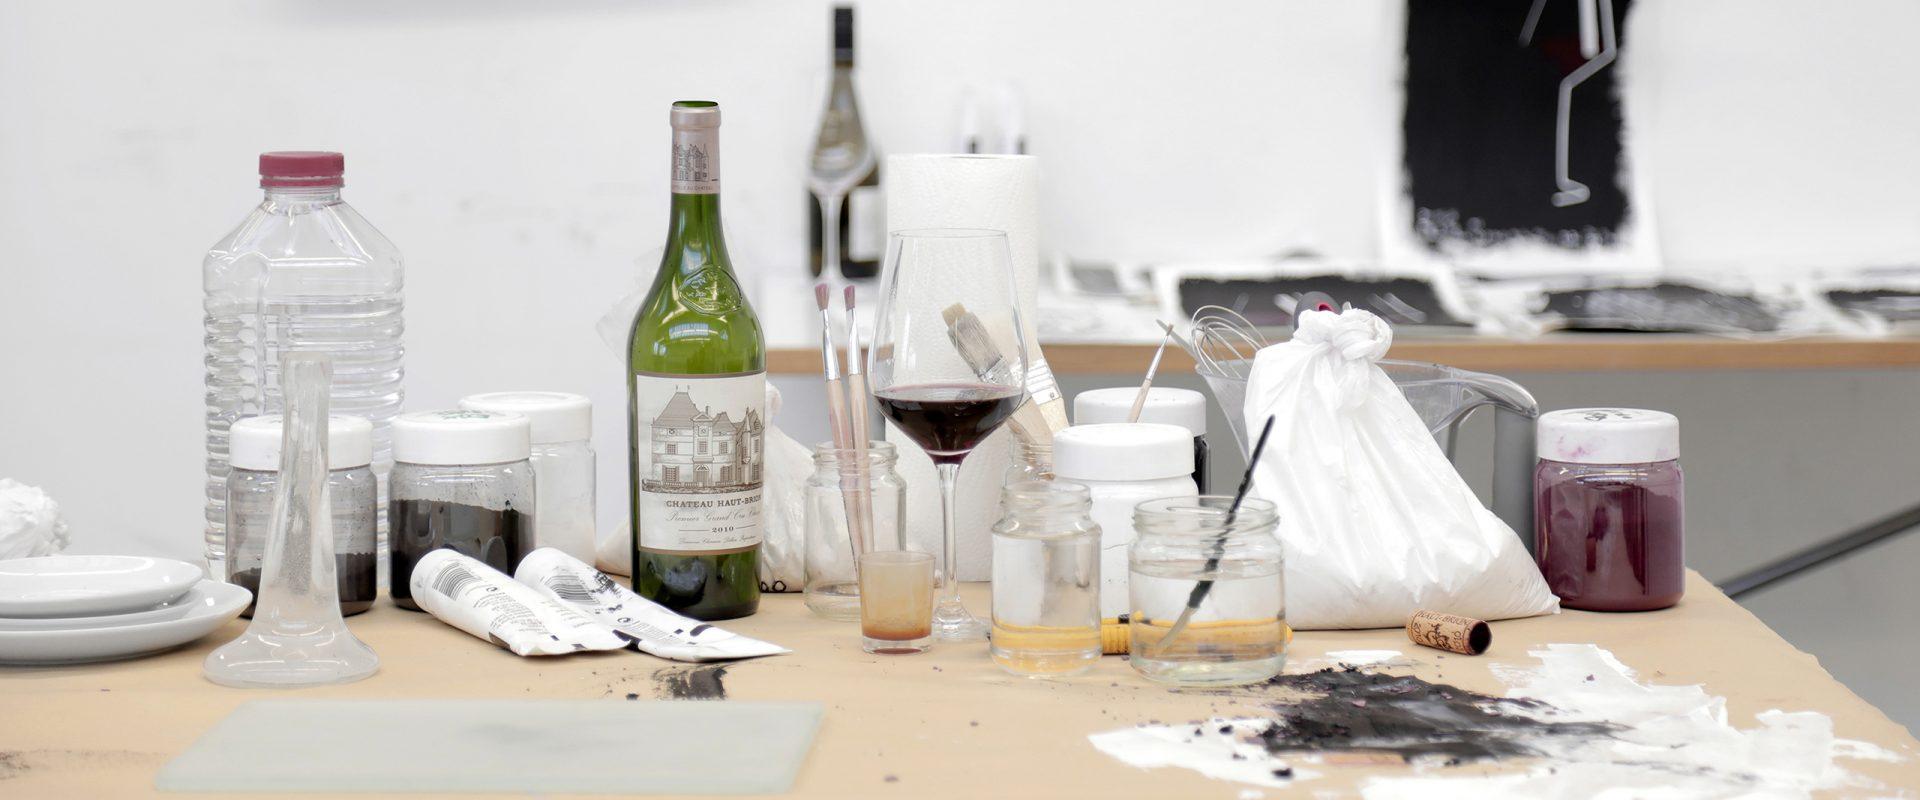 atelier_dario_succari_wine_art_painting_vin_wein_chateau_haut_brion_64x27_6